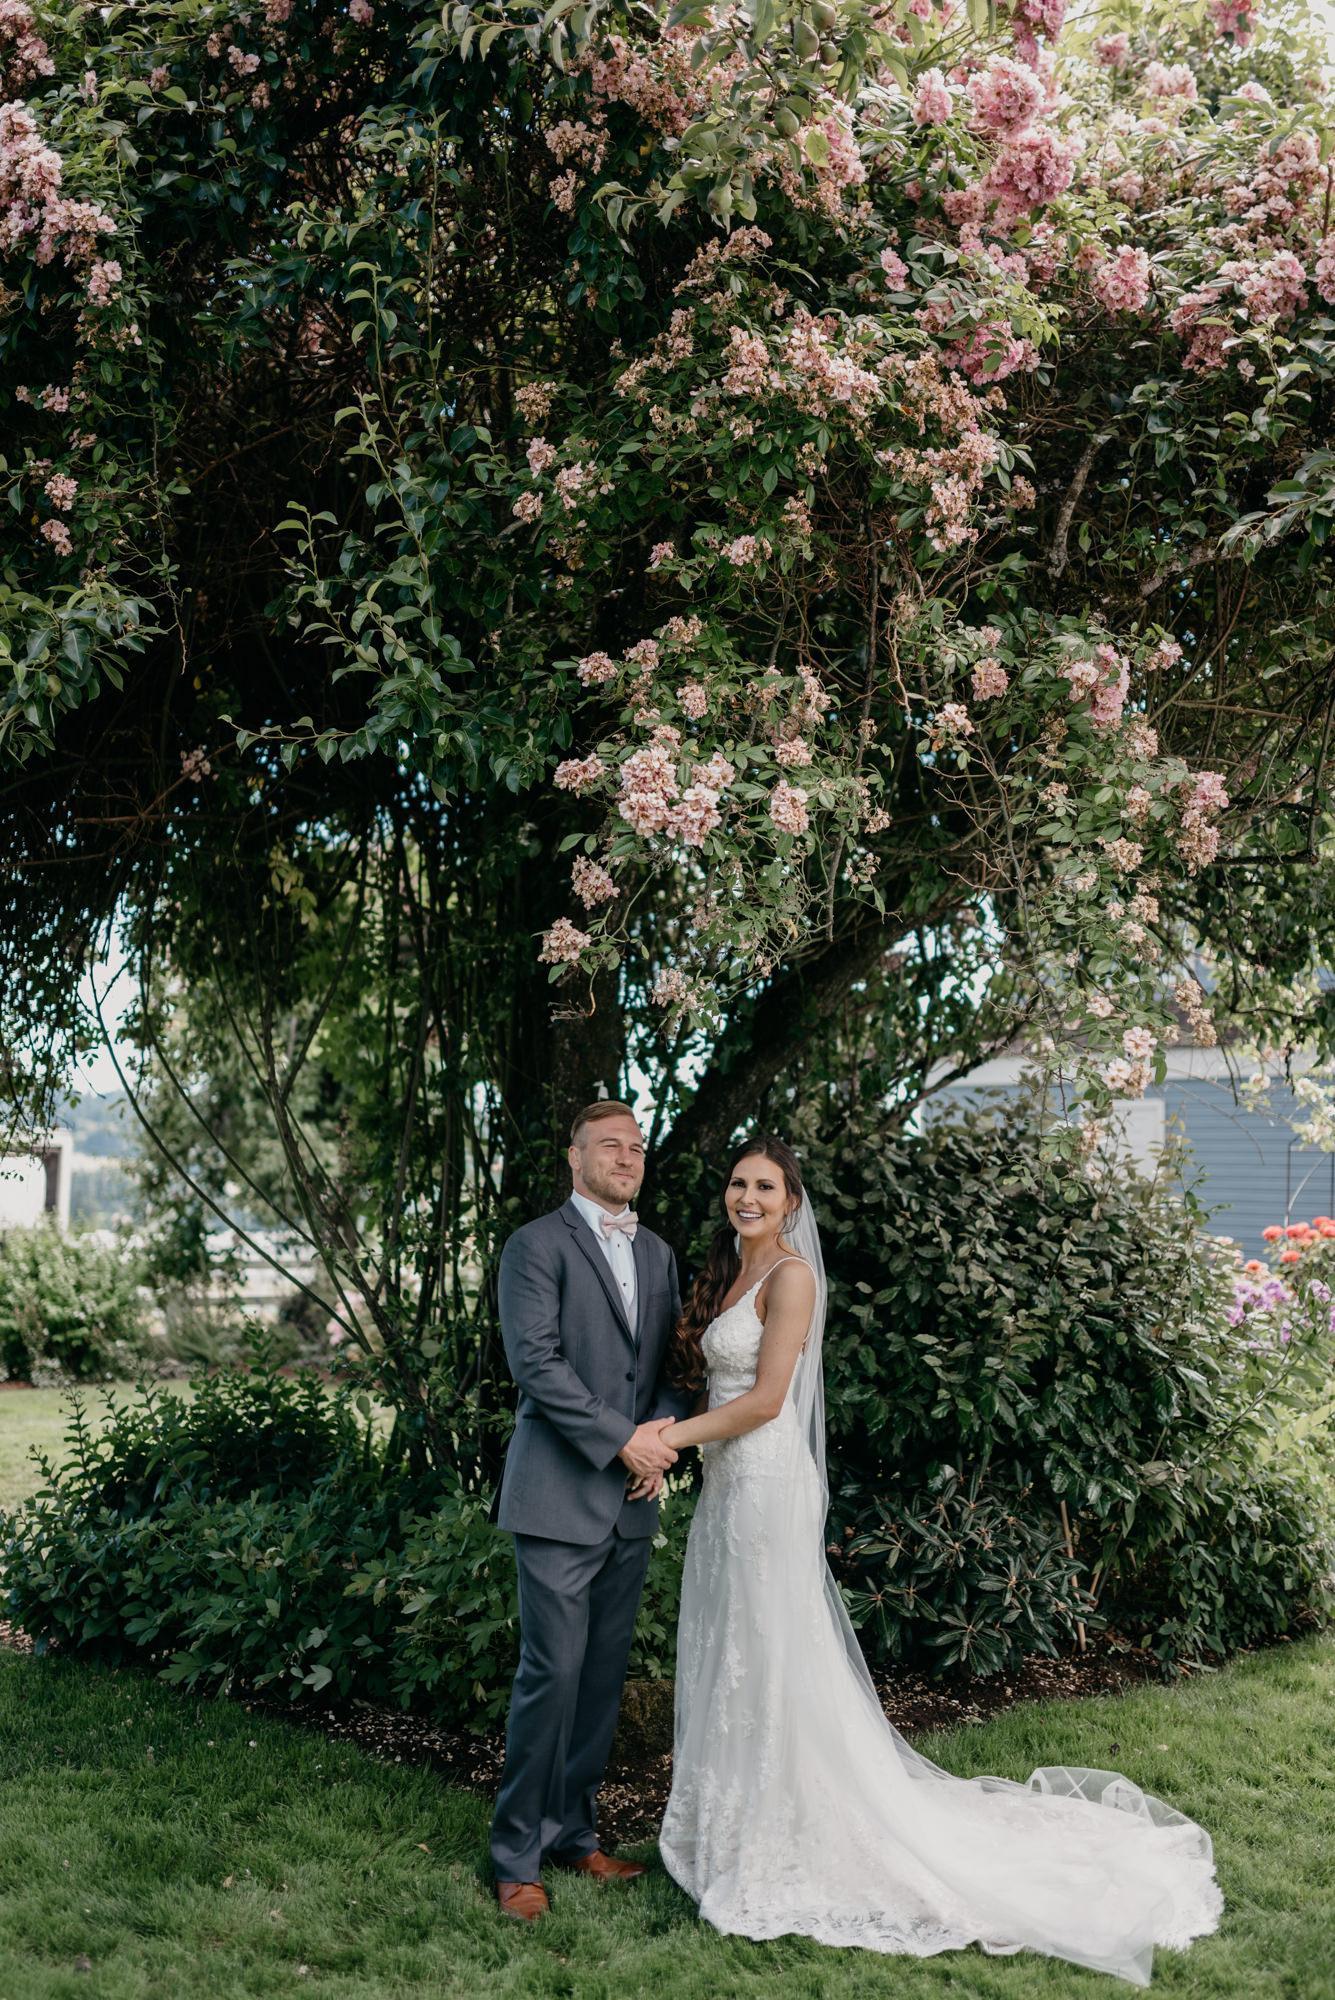 73-lake-oswego-wedding-portland-couple-rose-tree.jpg